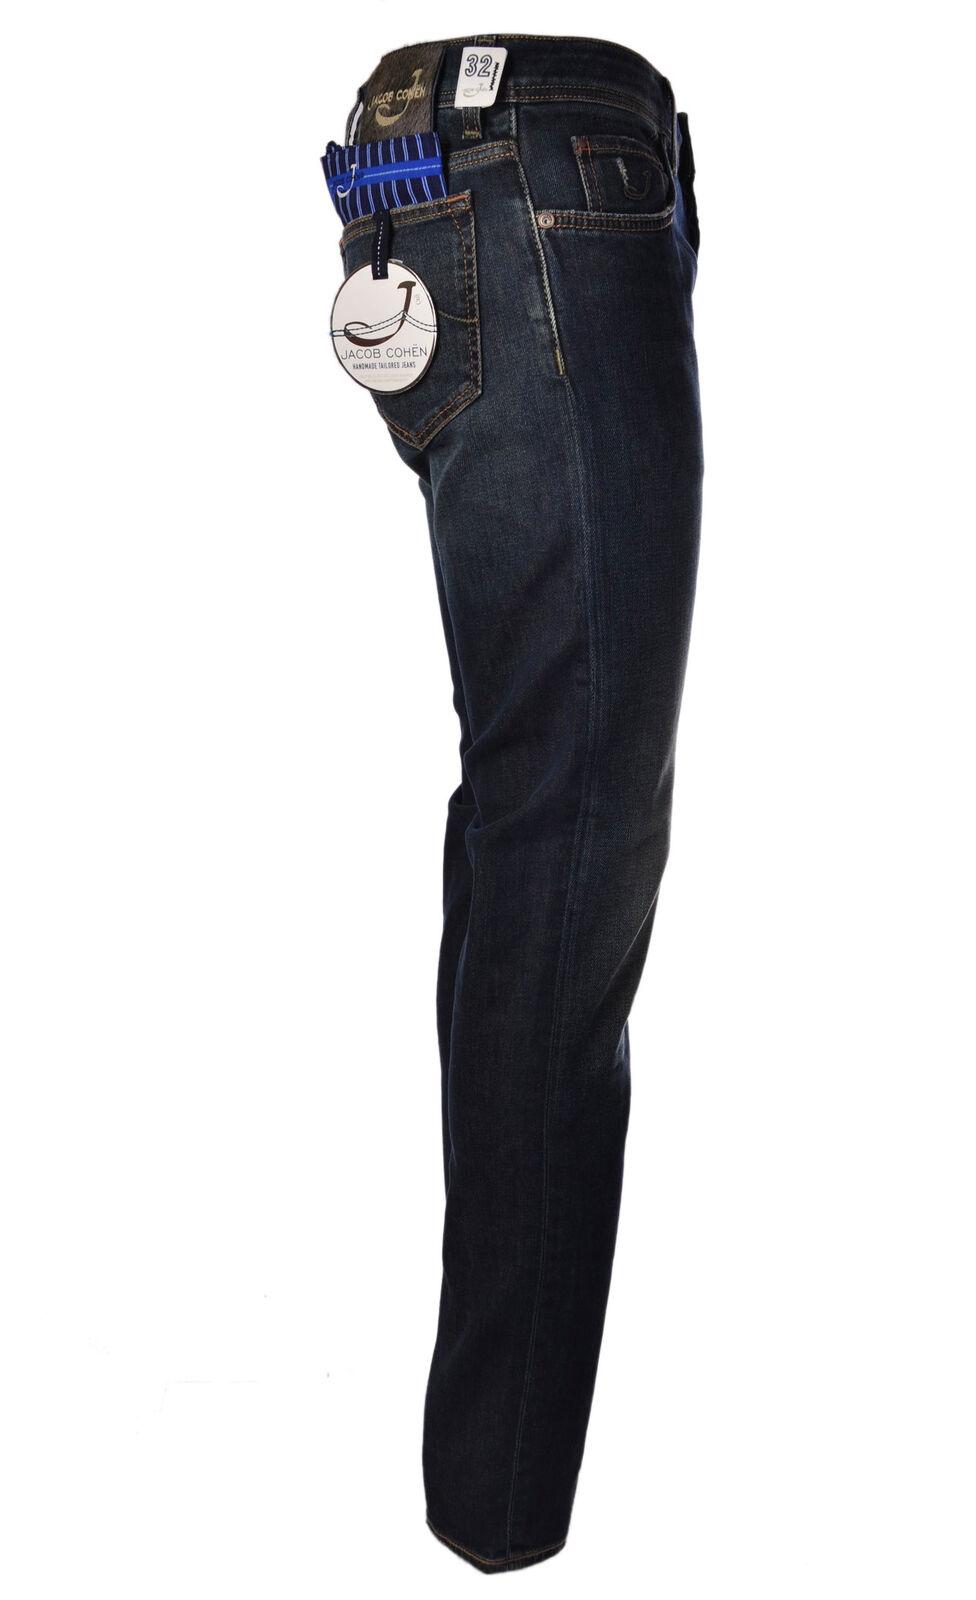 Jacob Cohen - Jeans-Pantaloni gamba dritta - Uomo - Denim - 434623C183458